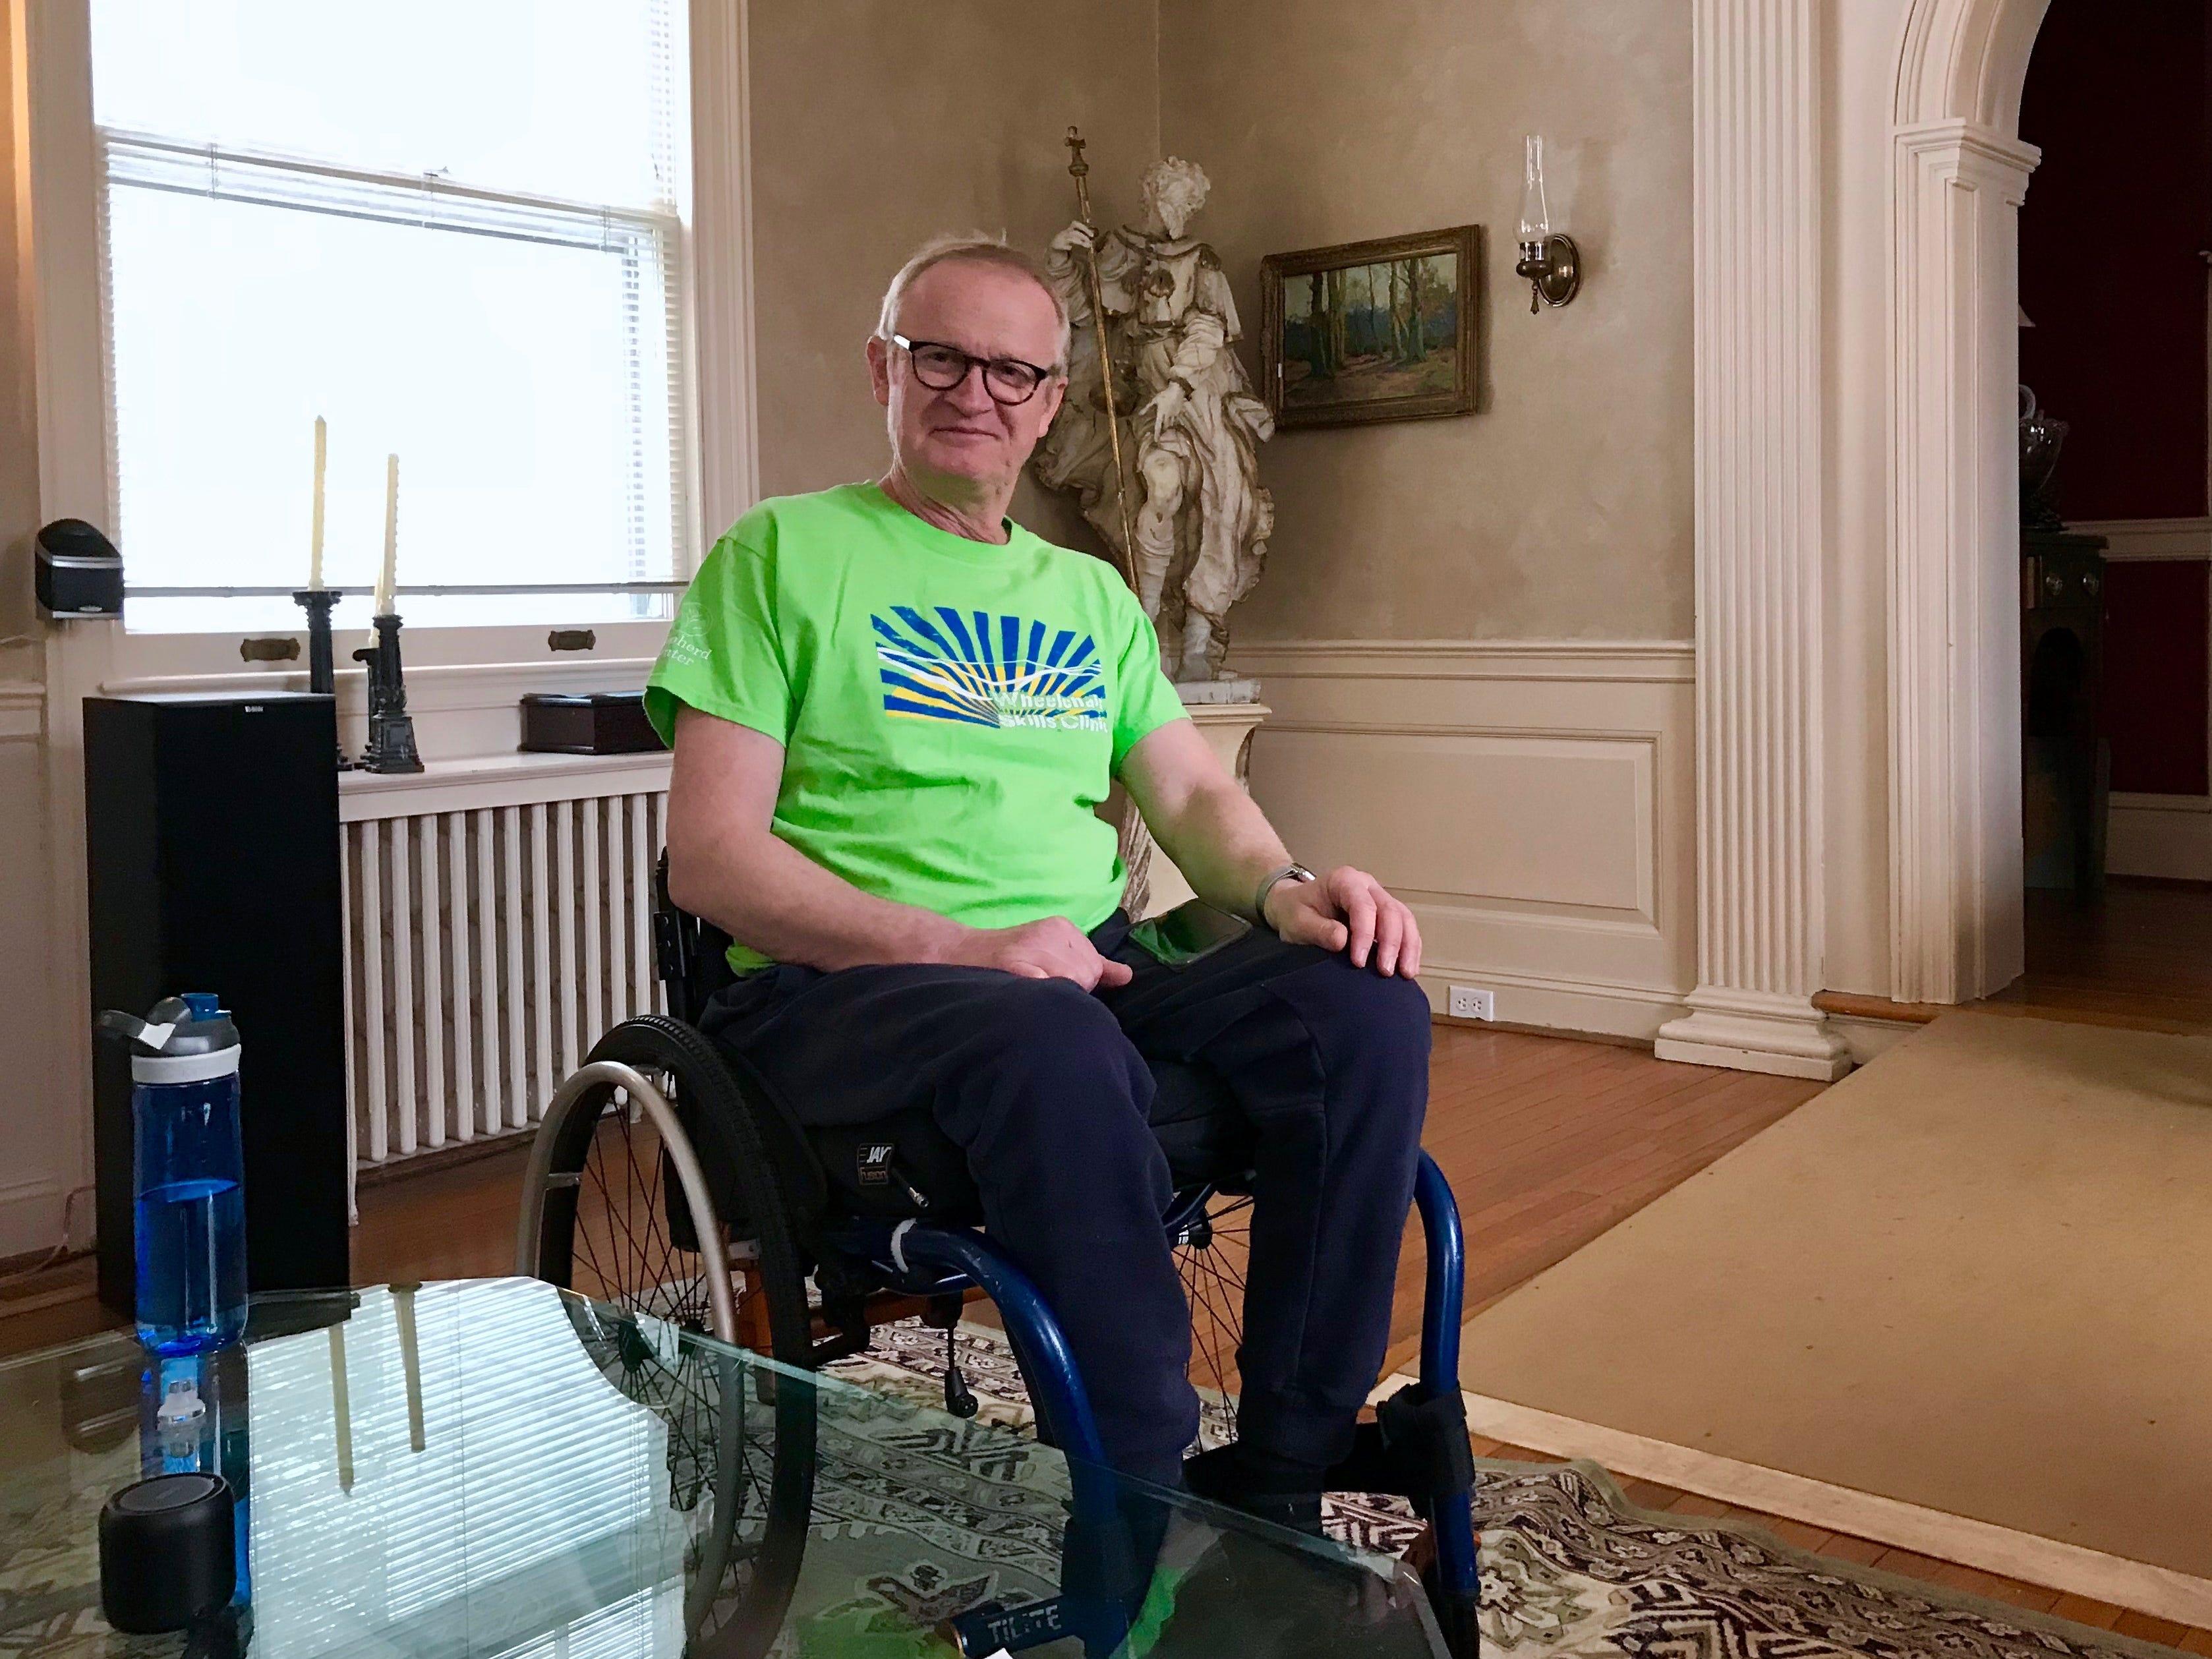 Dr. Robert Kyler in his home in Staunton, Virginia, on Friday, March 8, 2019.